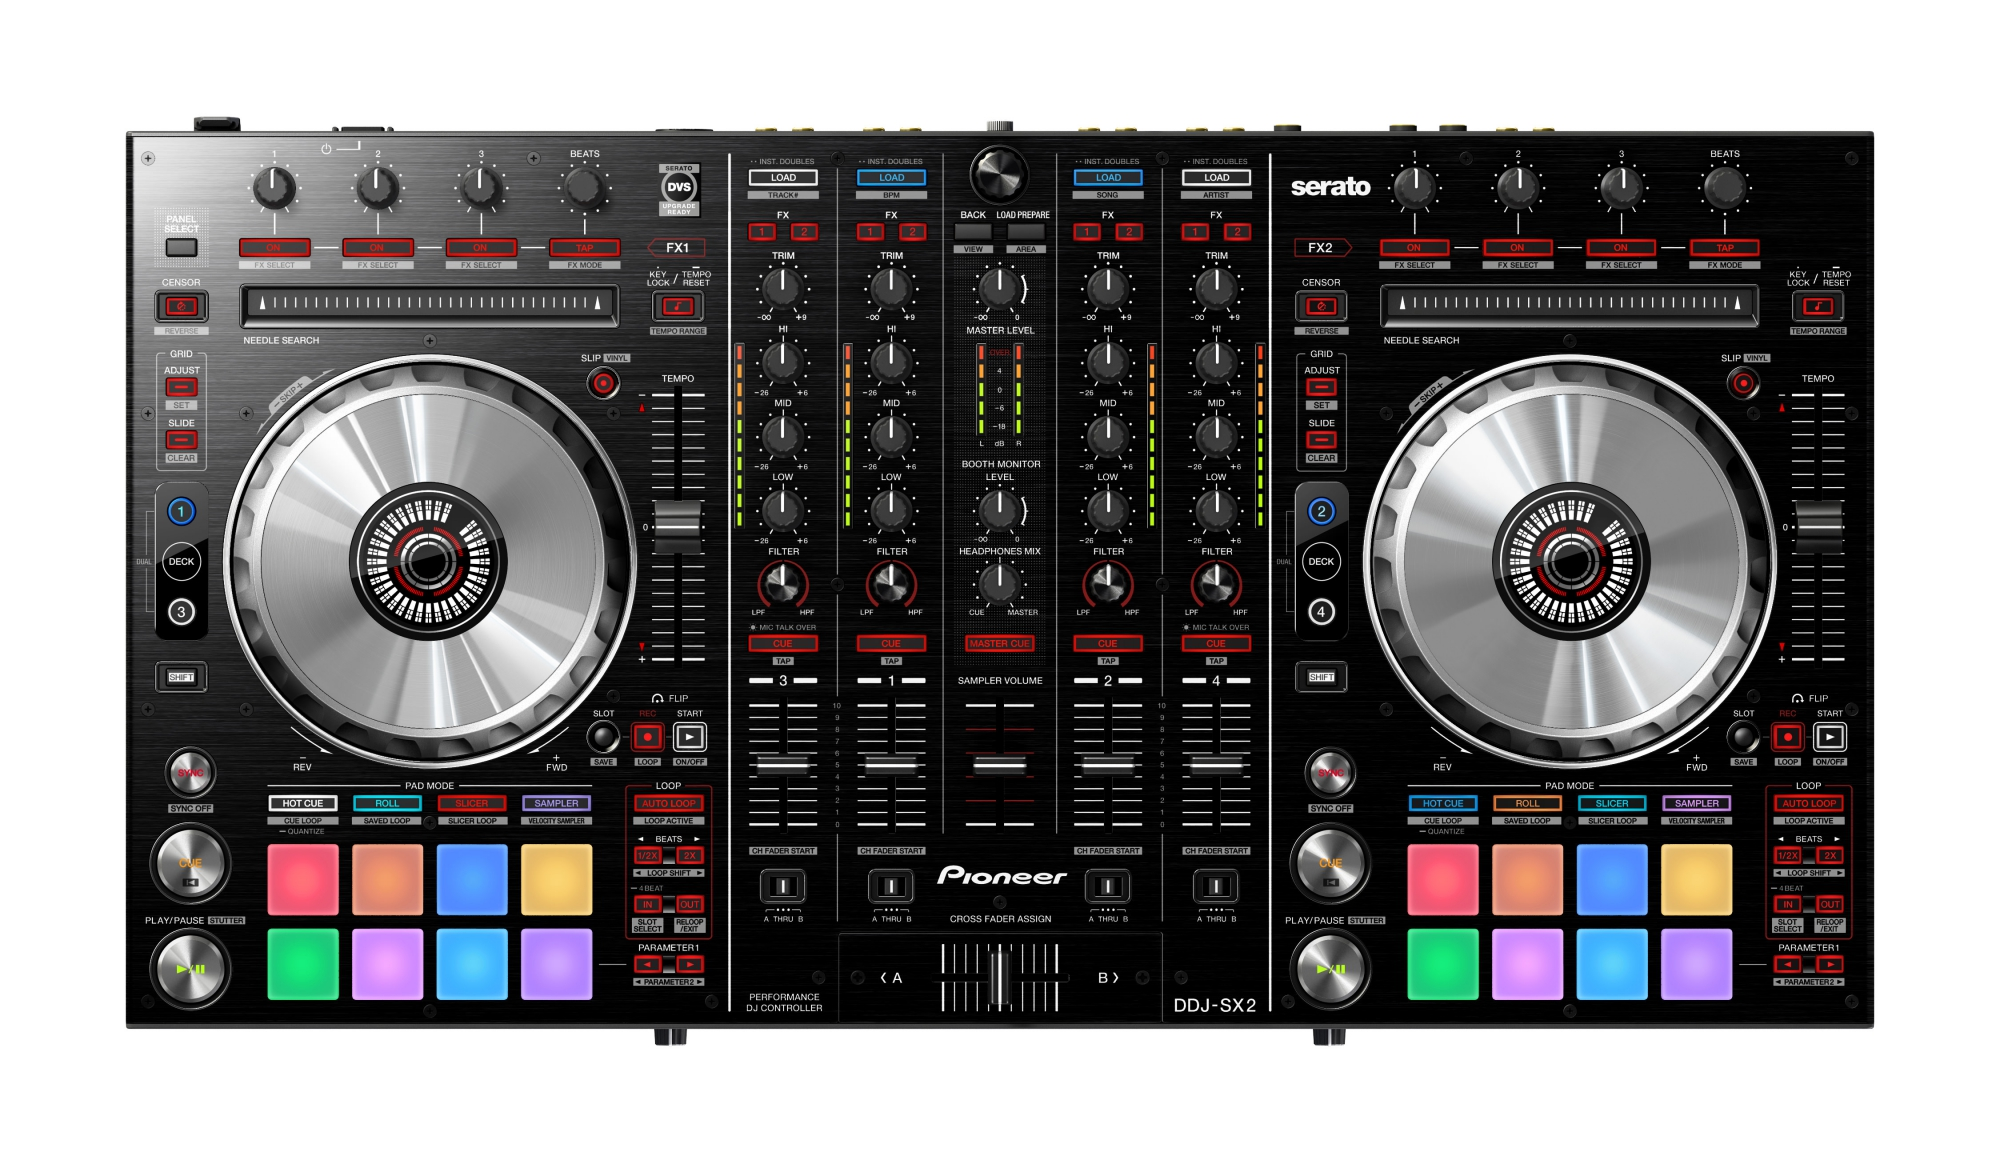 Pioneer DDJ-SX2 DJ-controller